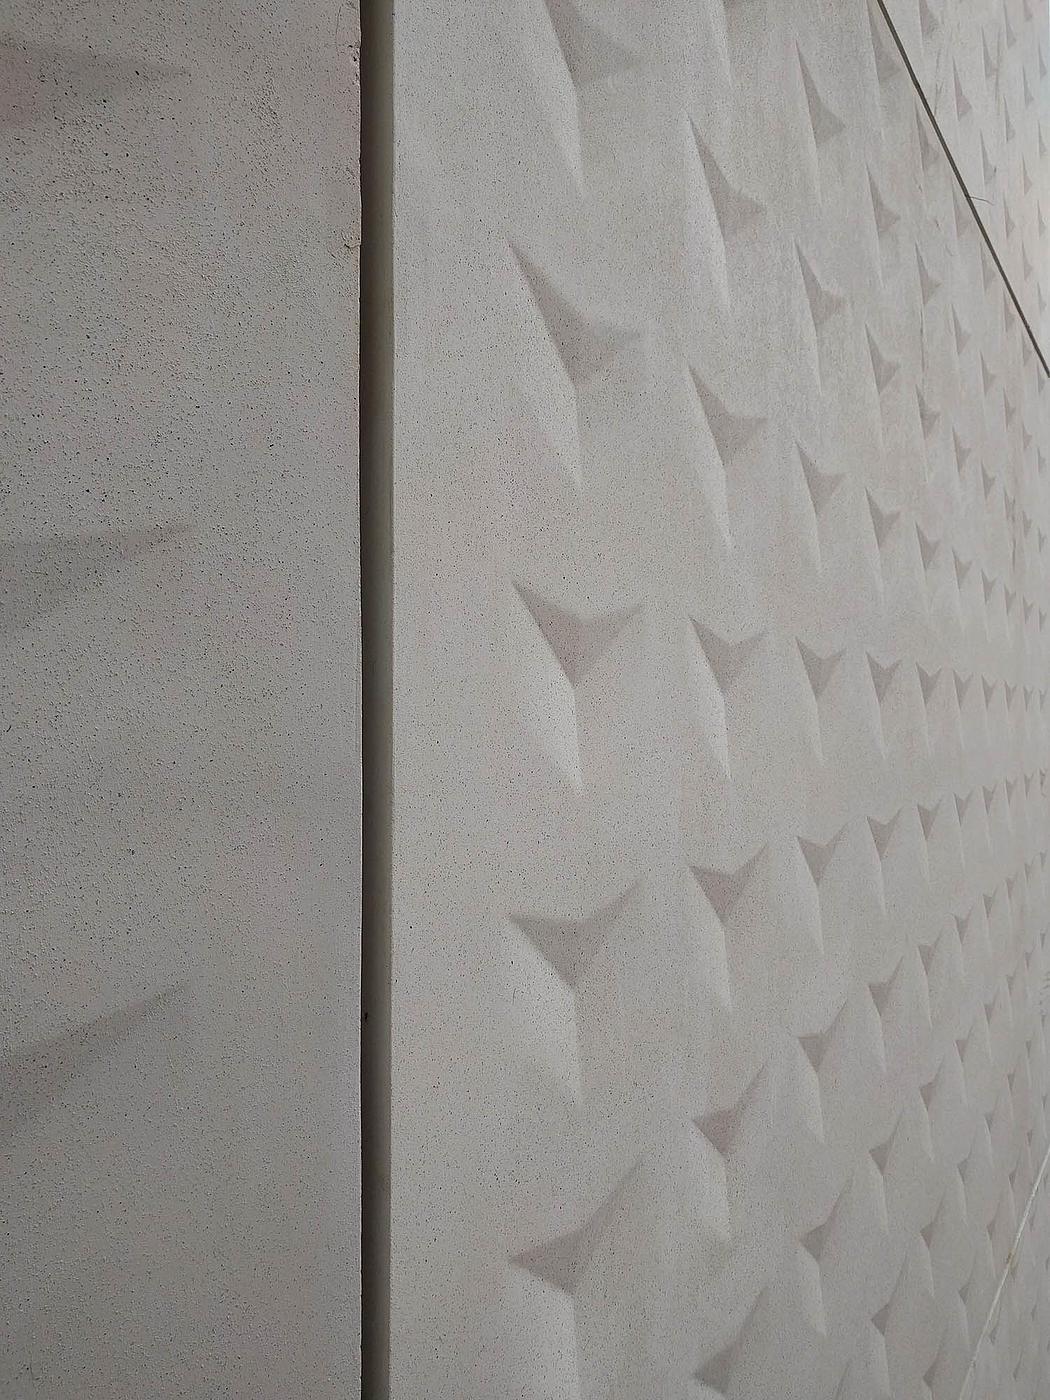 Precast Concrete Cladding Sheets : Mica working with concrete